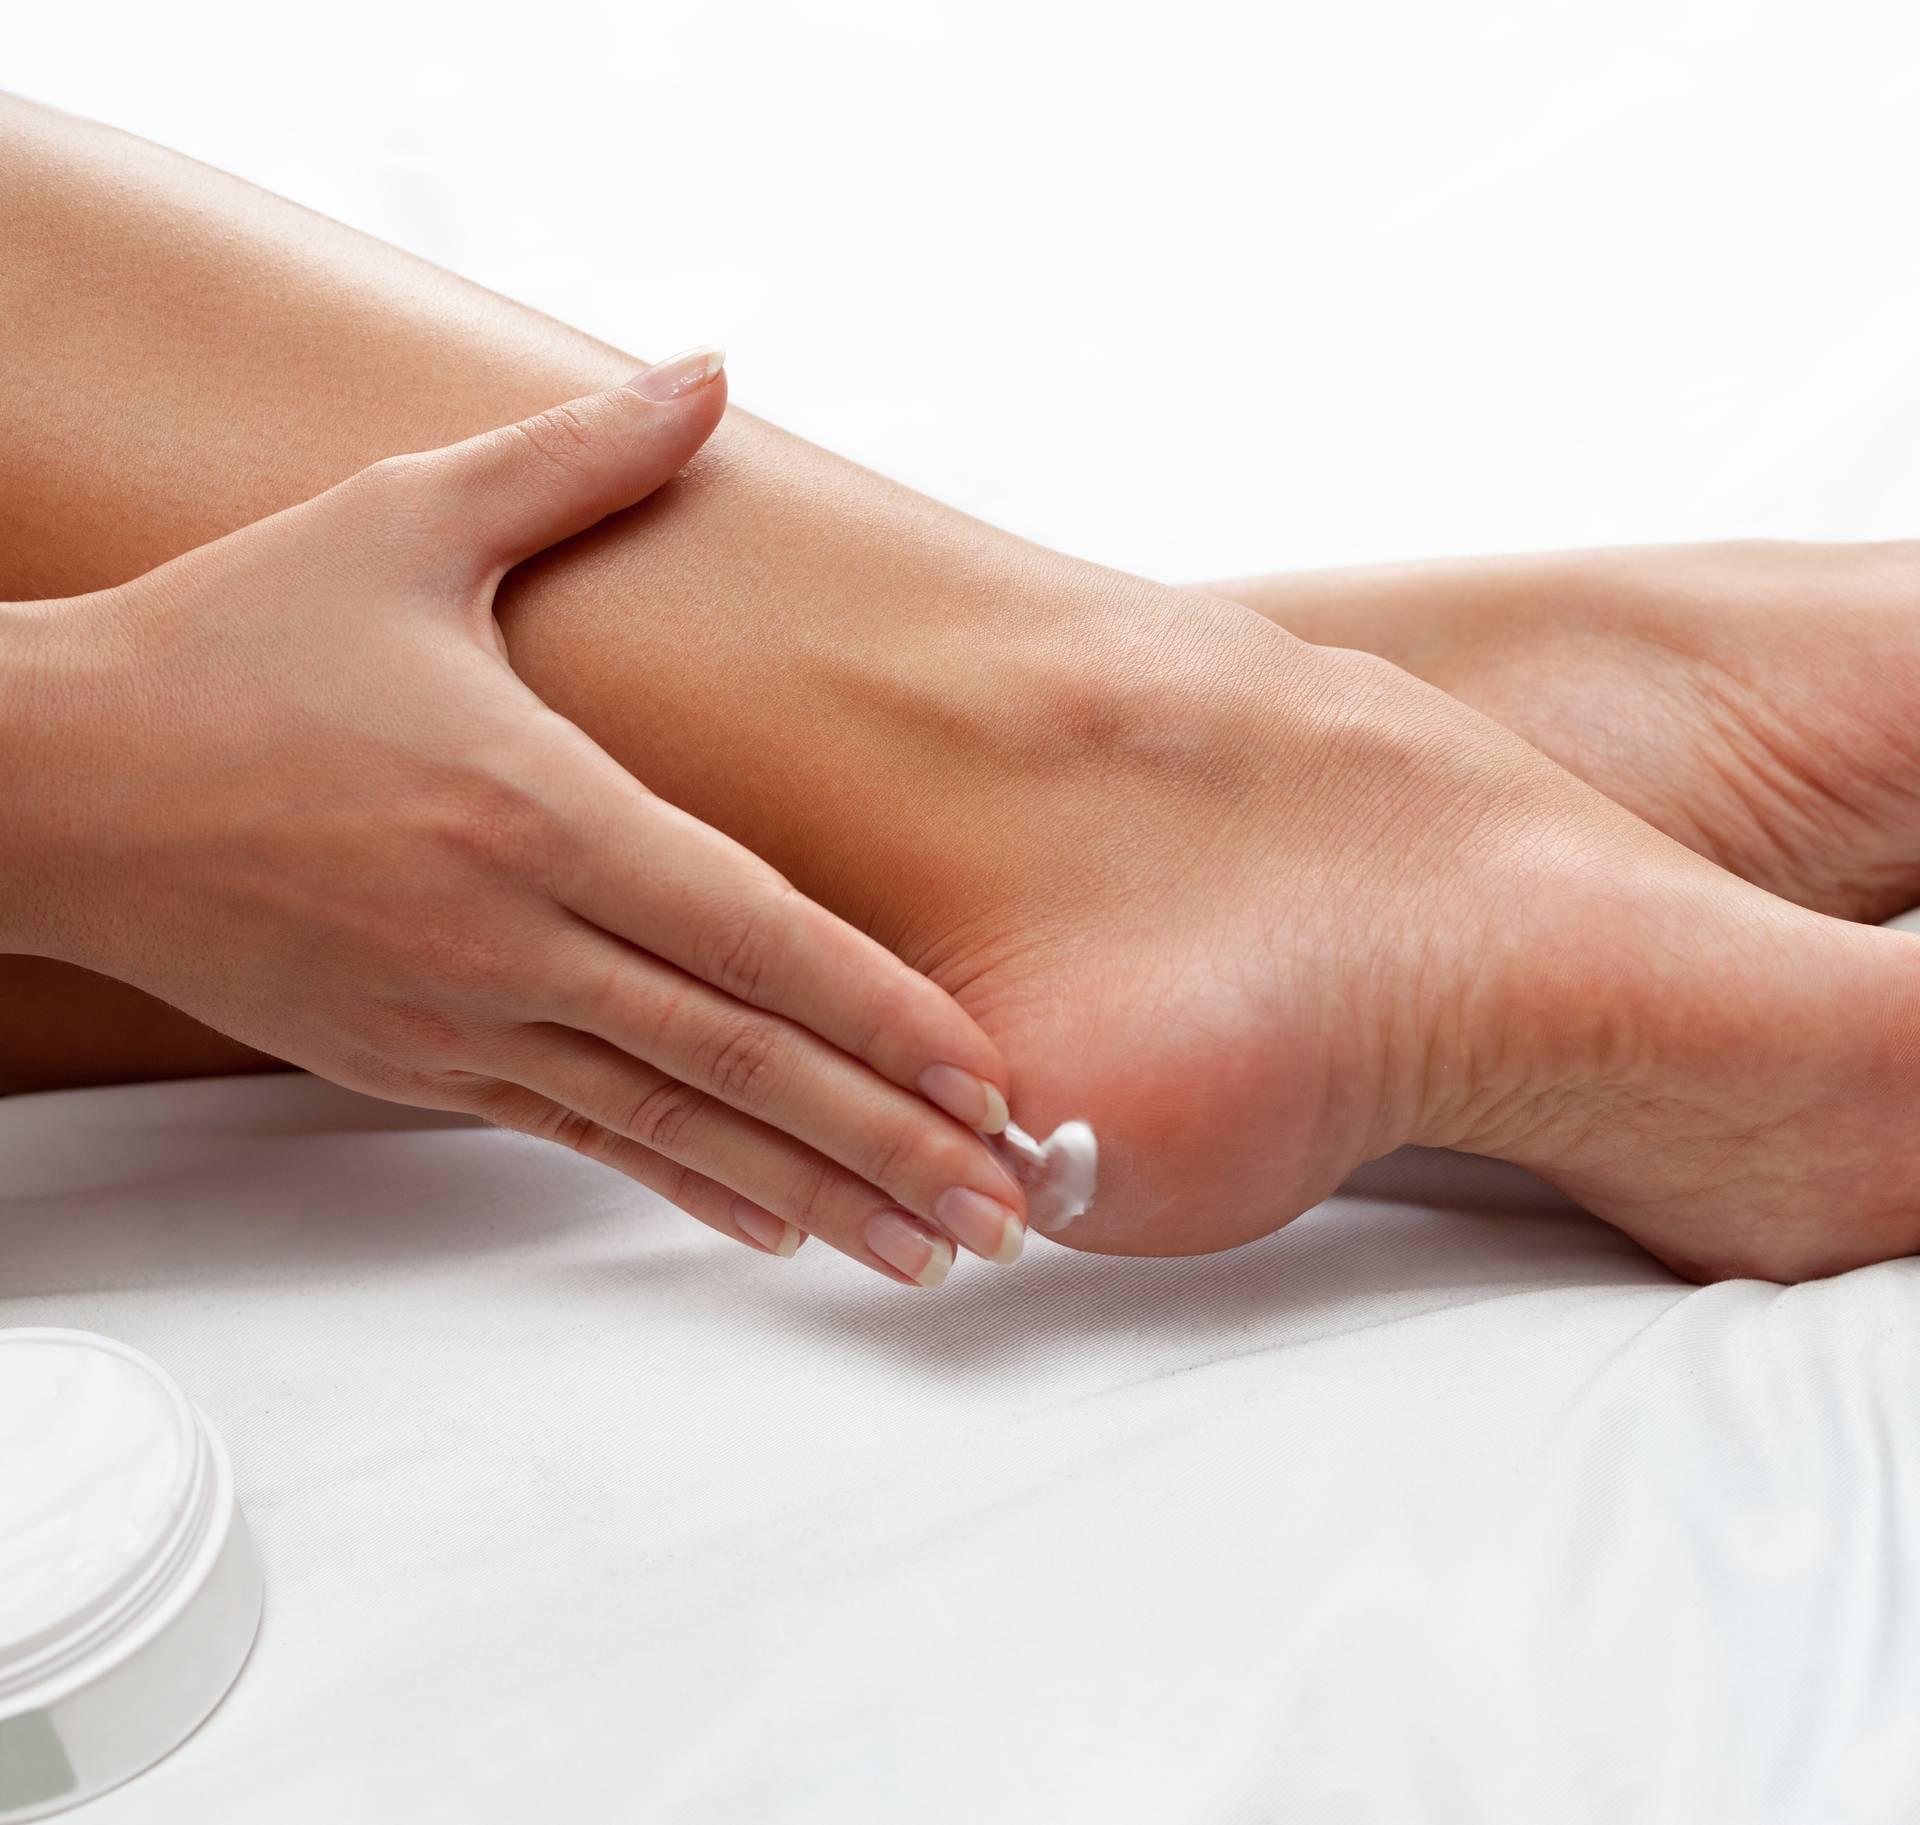 applying cream on feet